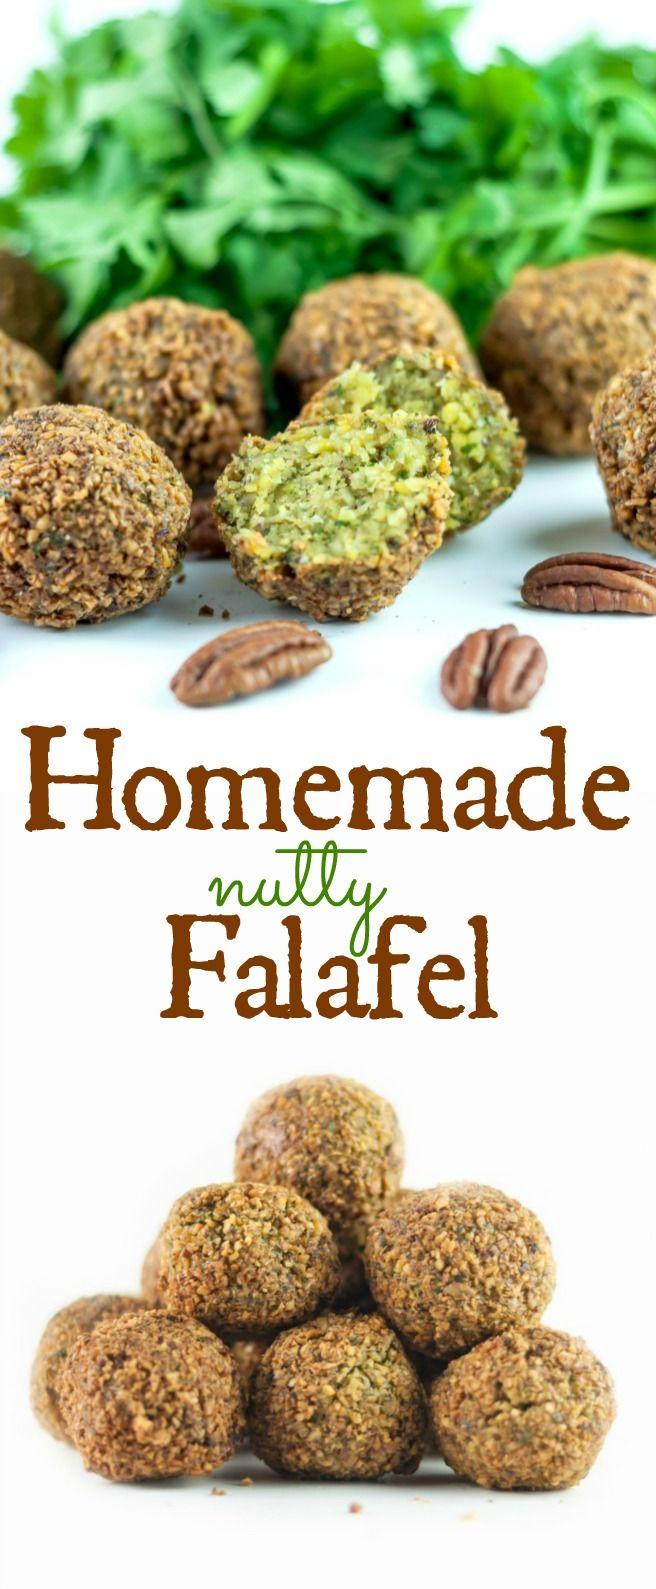 Homemade Nutty Falafel